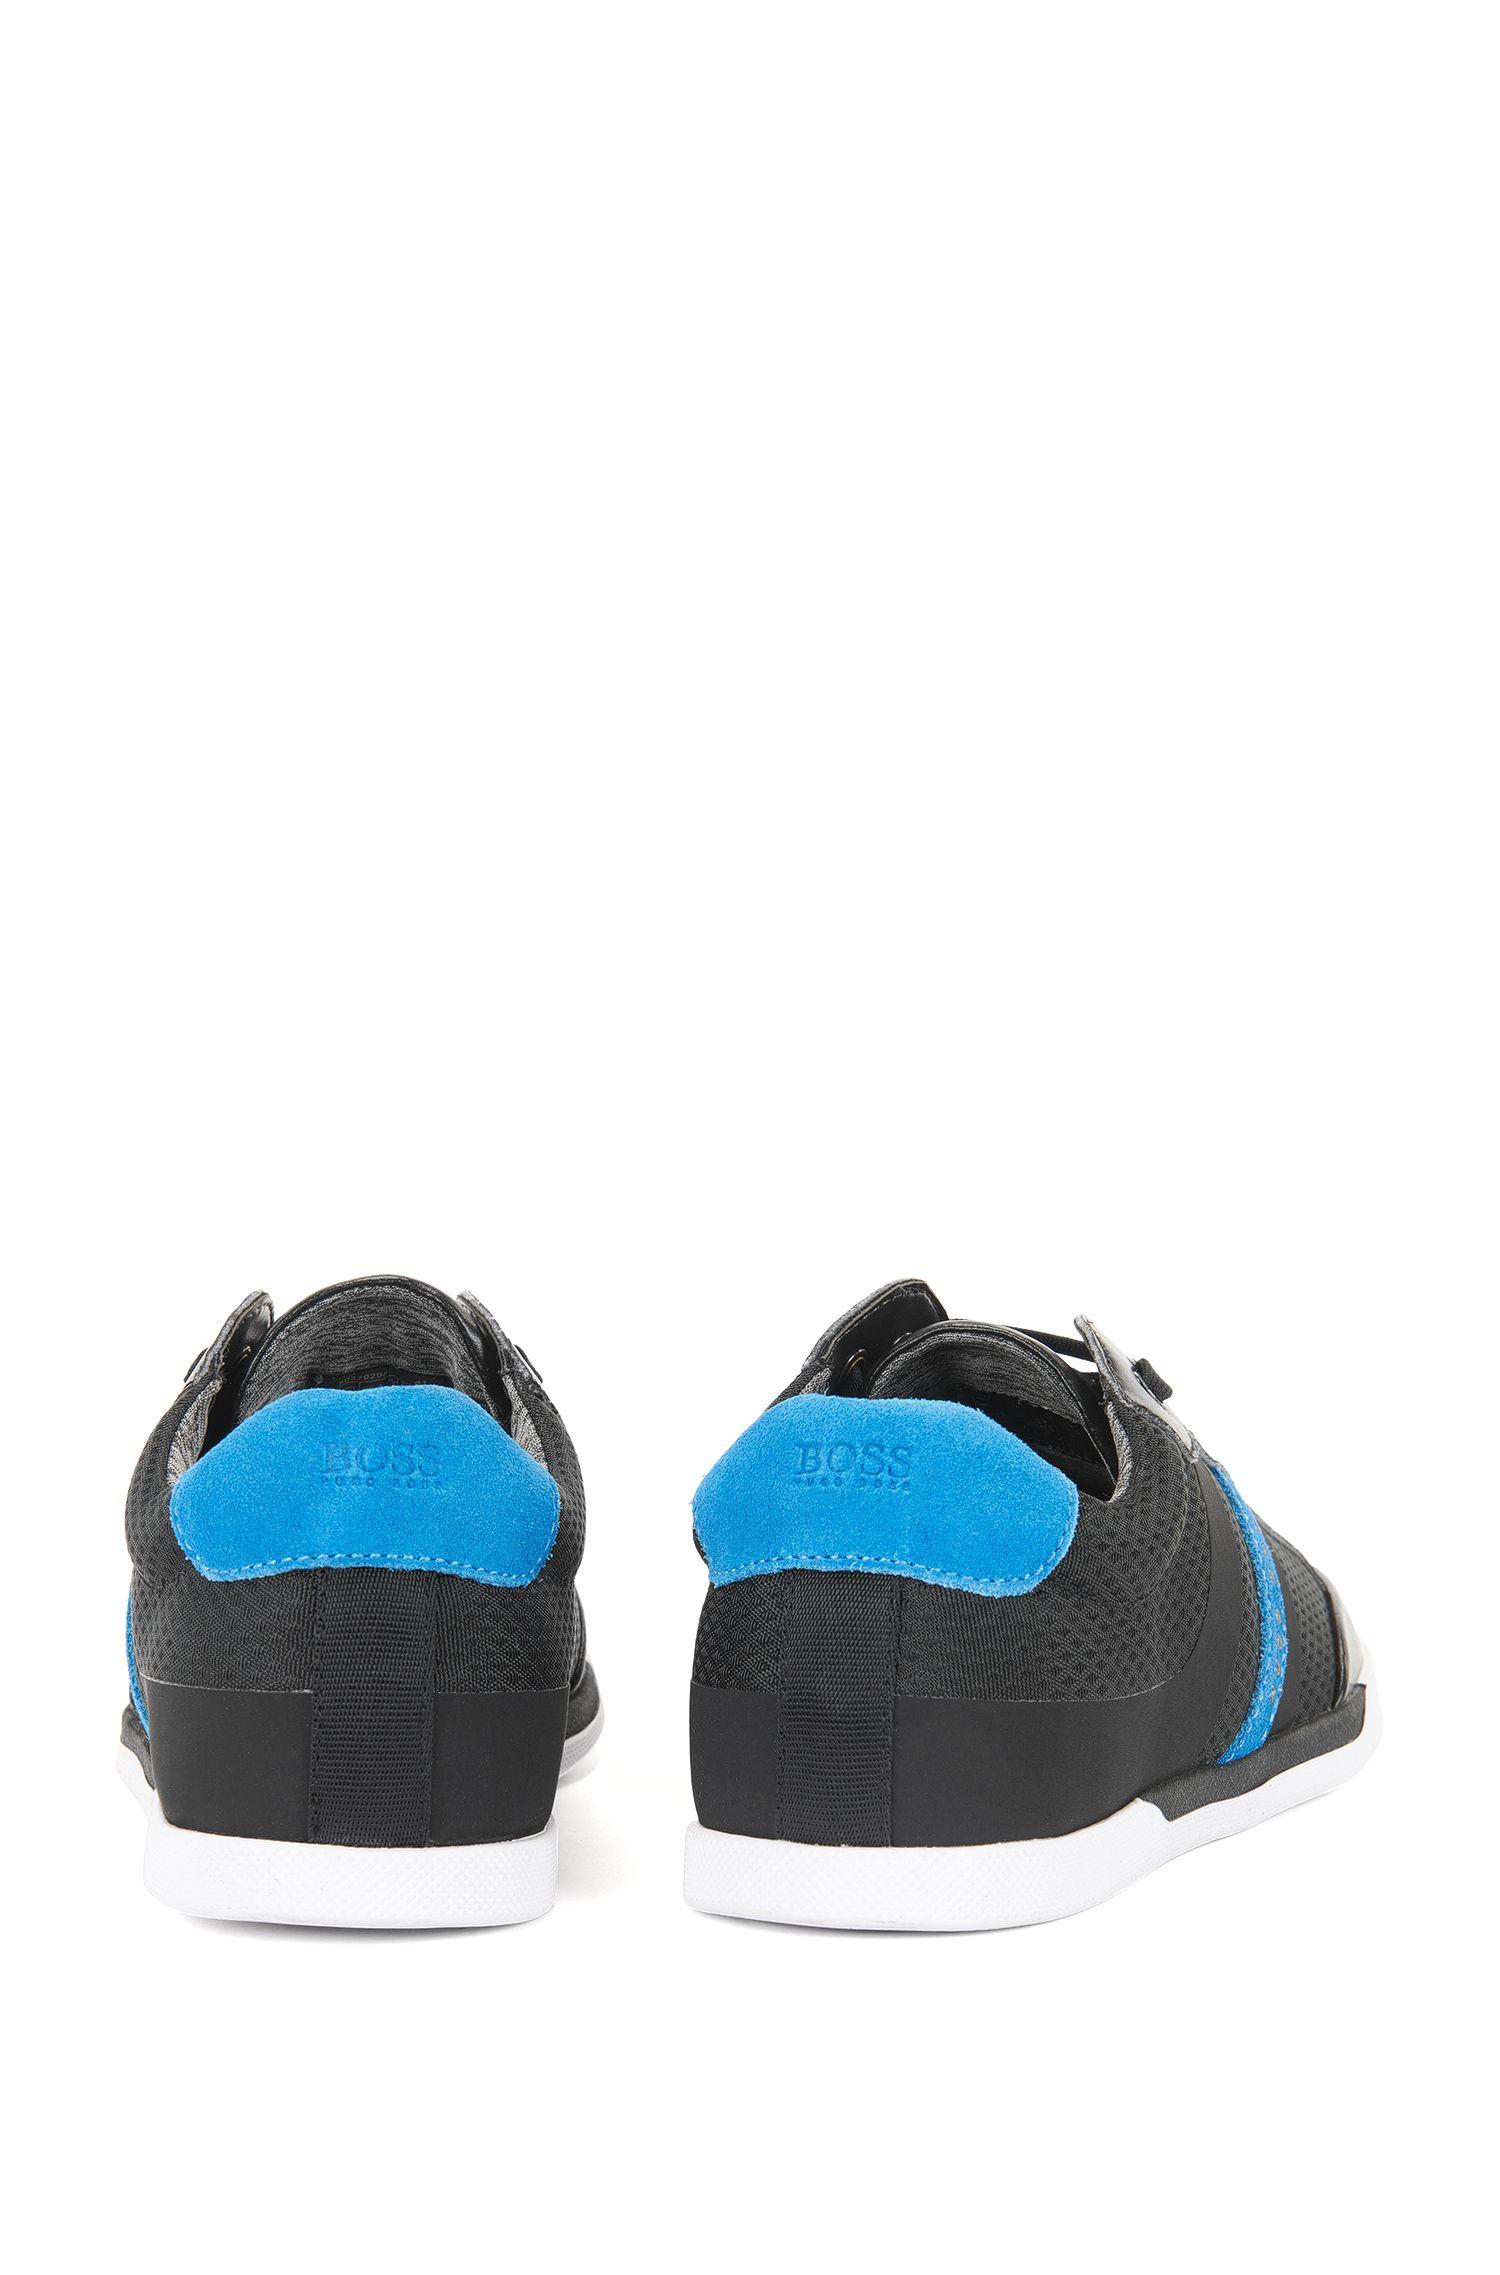 Mesh Sneaker | Shuttle Tenn It, Black